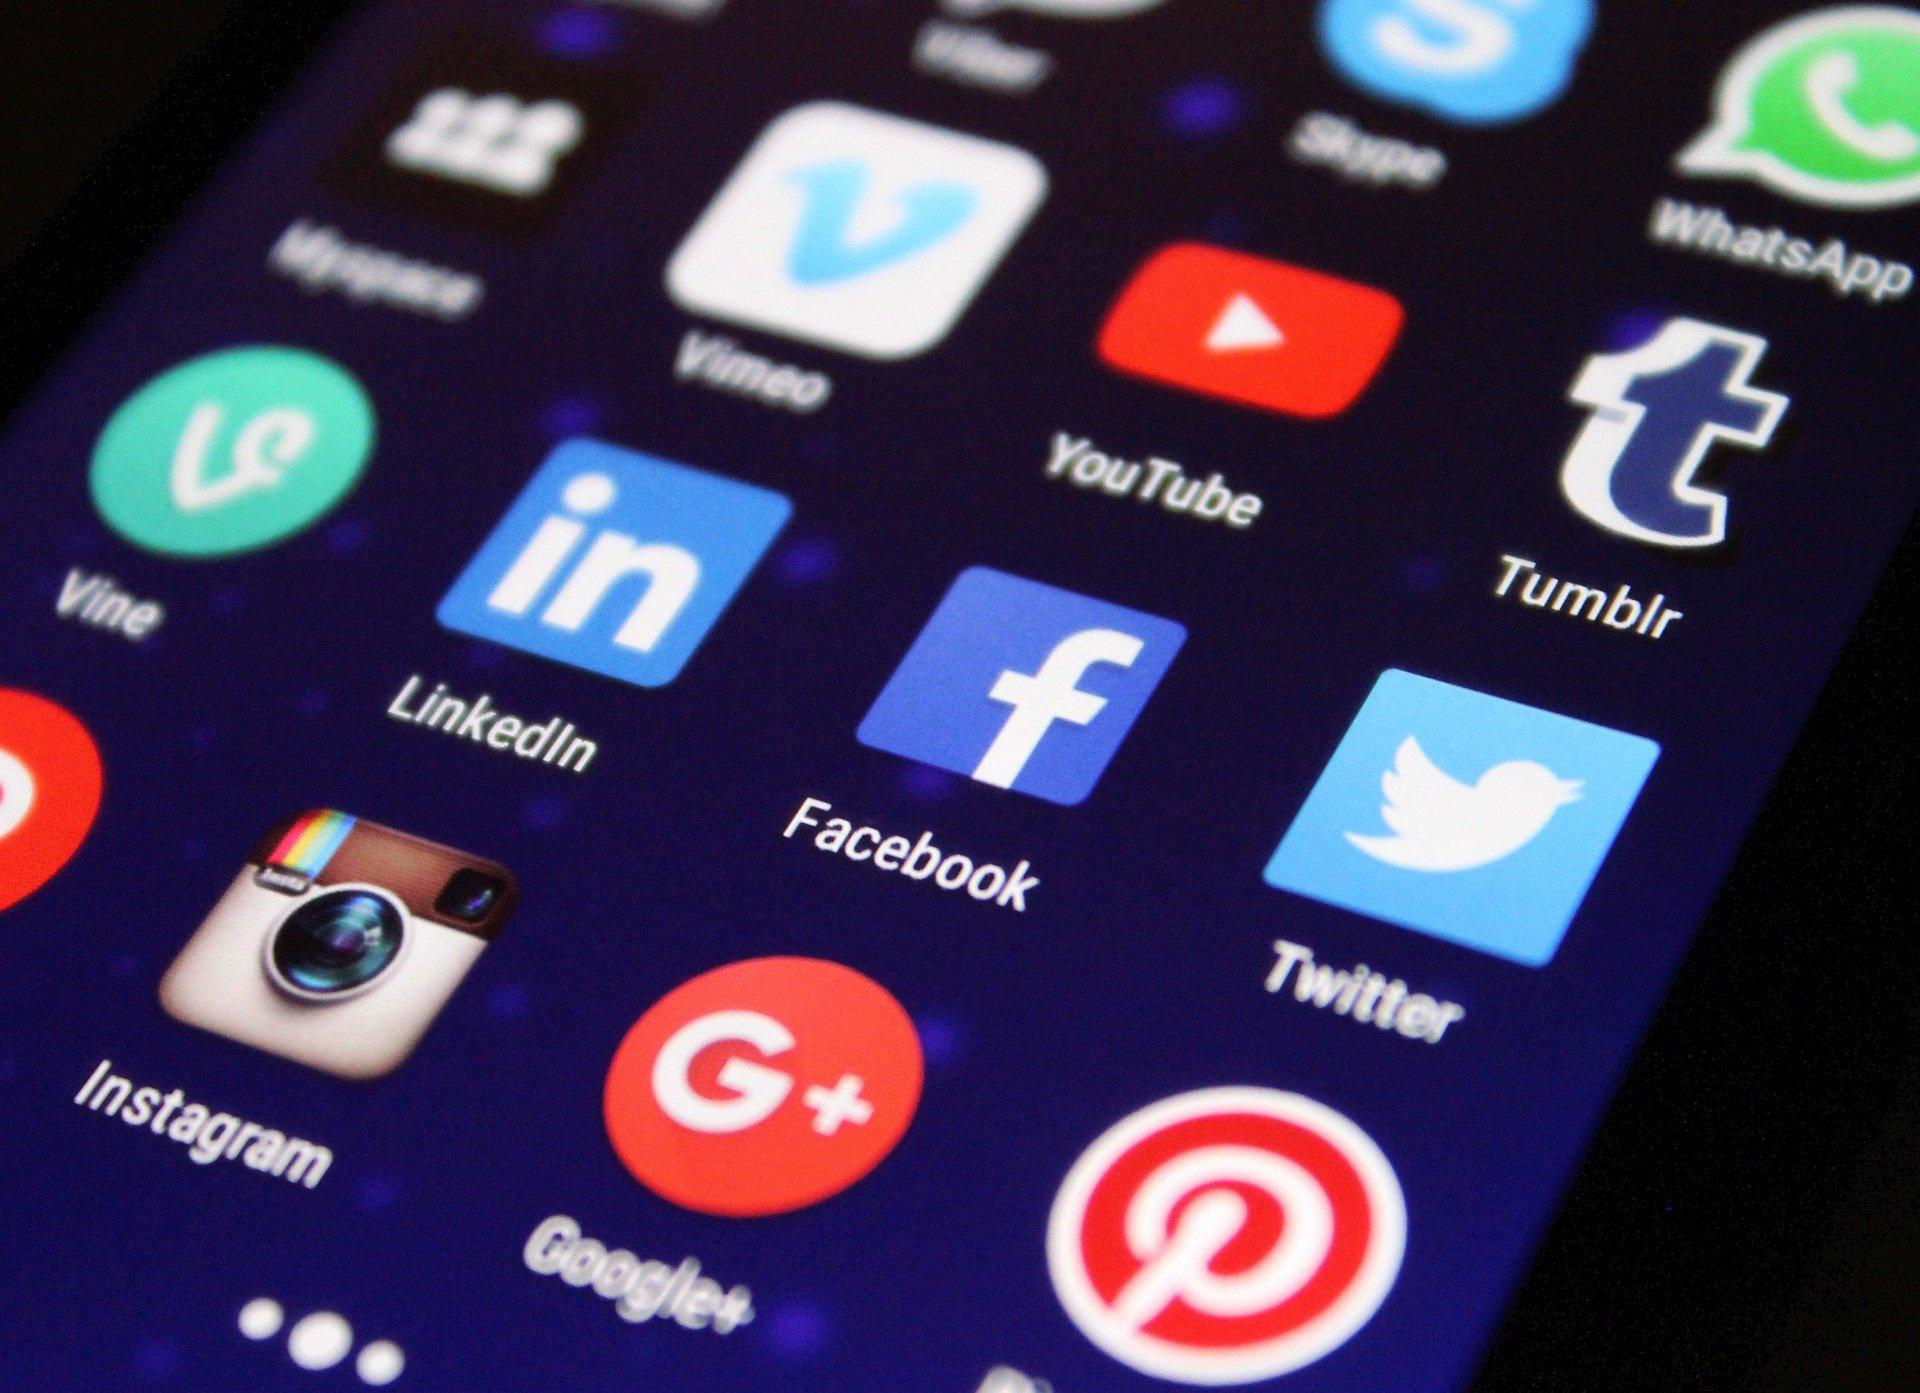 Top 5 Social Media Marketing Tips to Dominate 2021